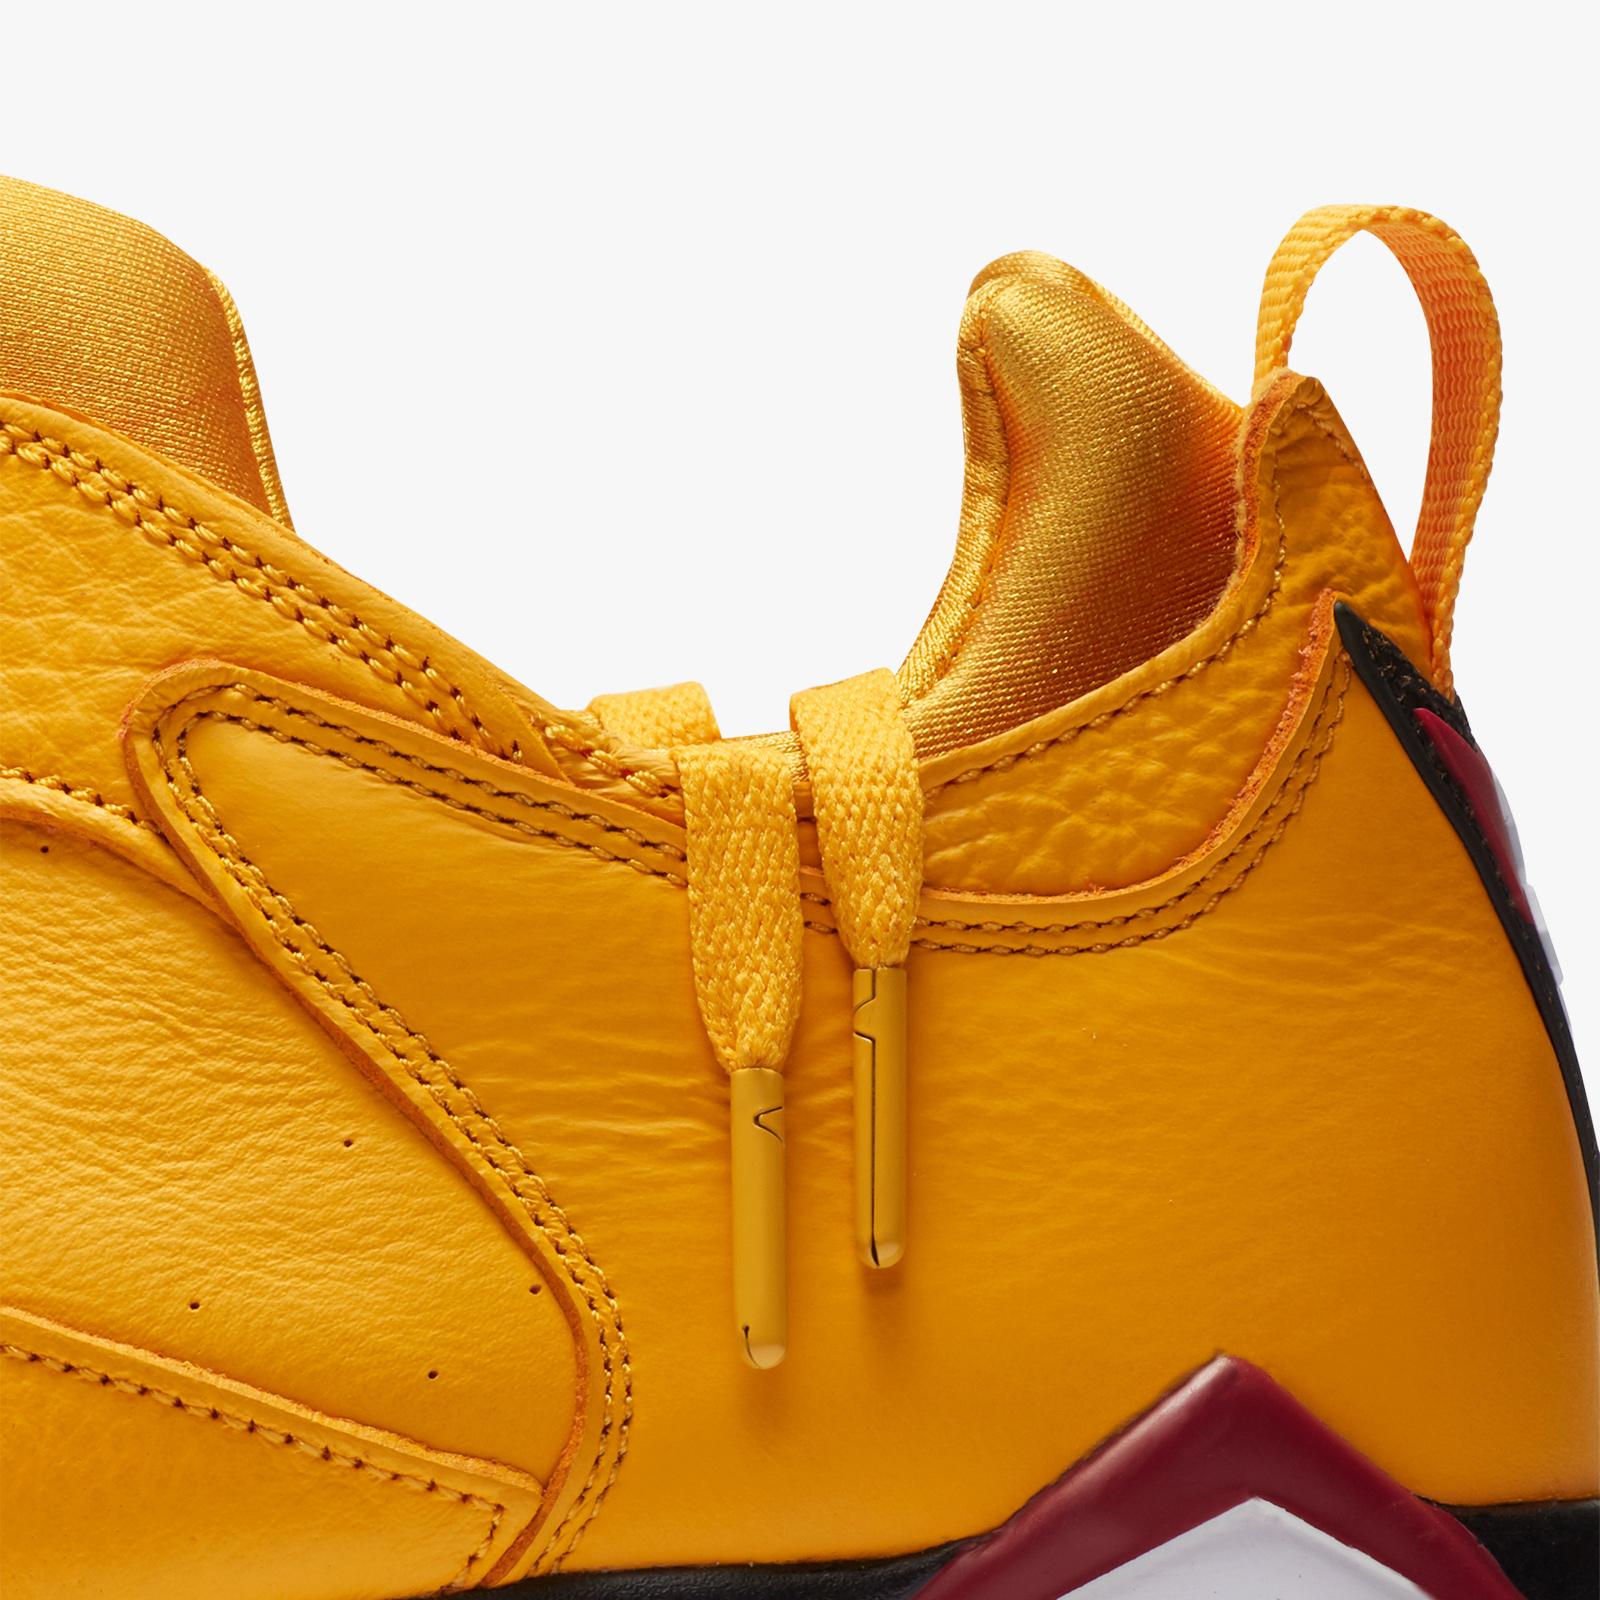 234abb8dc856 Jordan Brand Air Jordan 7 Low NRG - Ar4422-701 - Sneakersnstuff ...